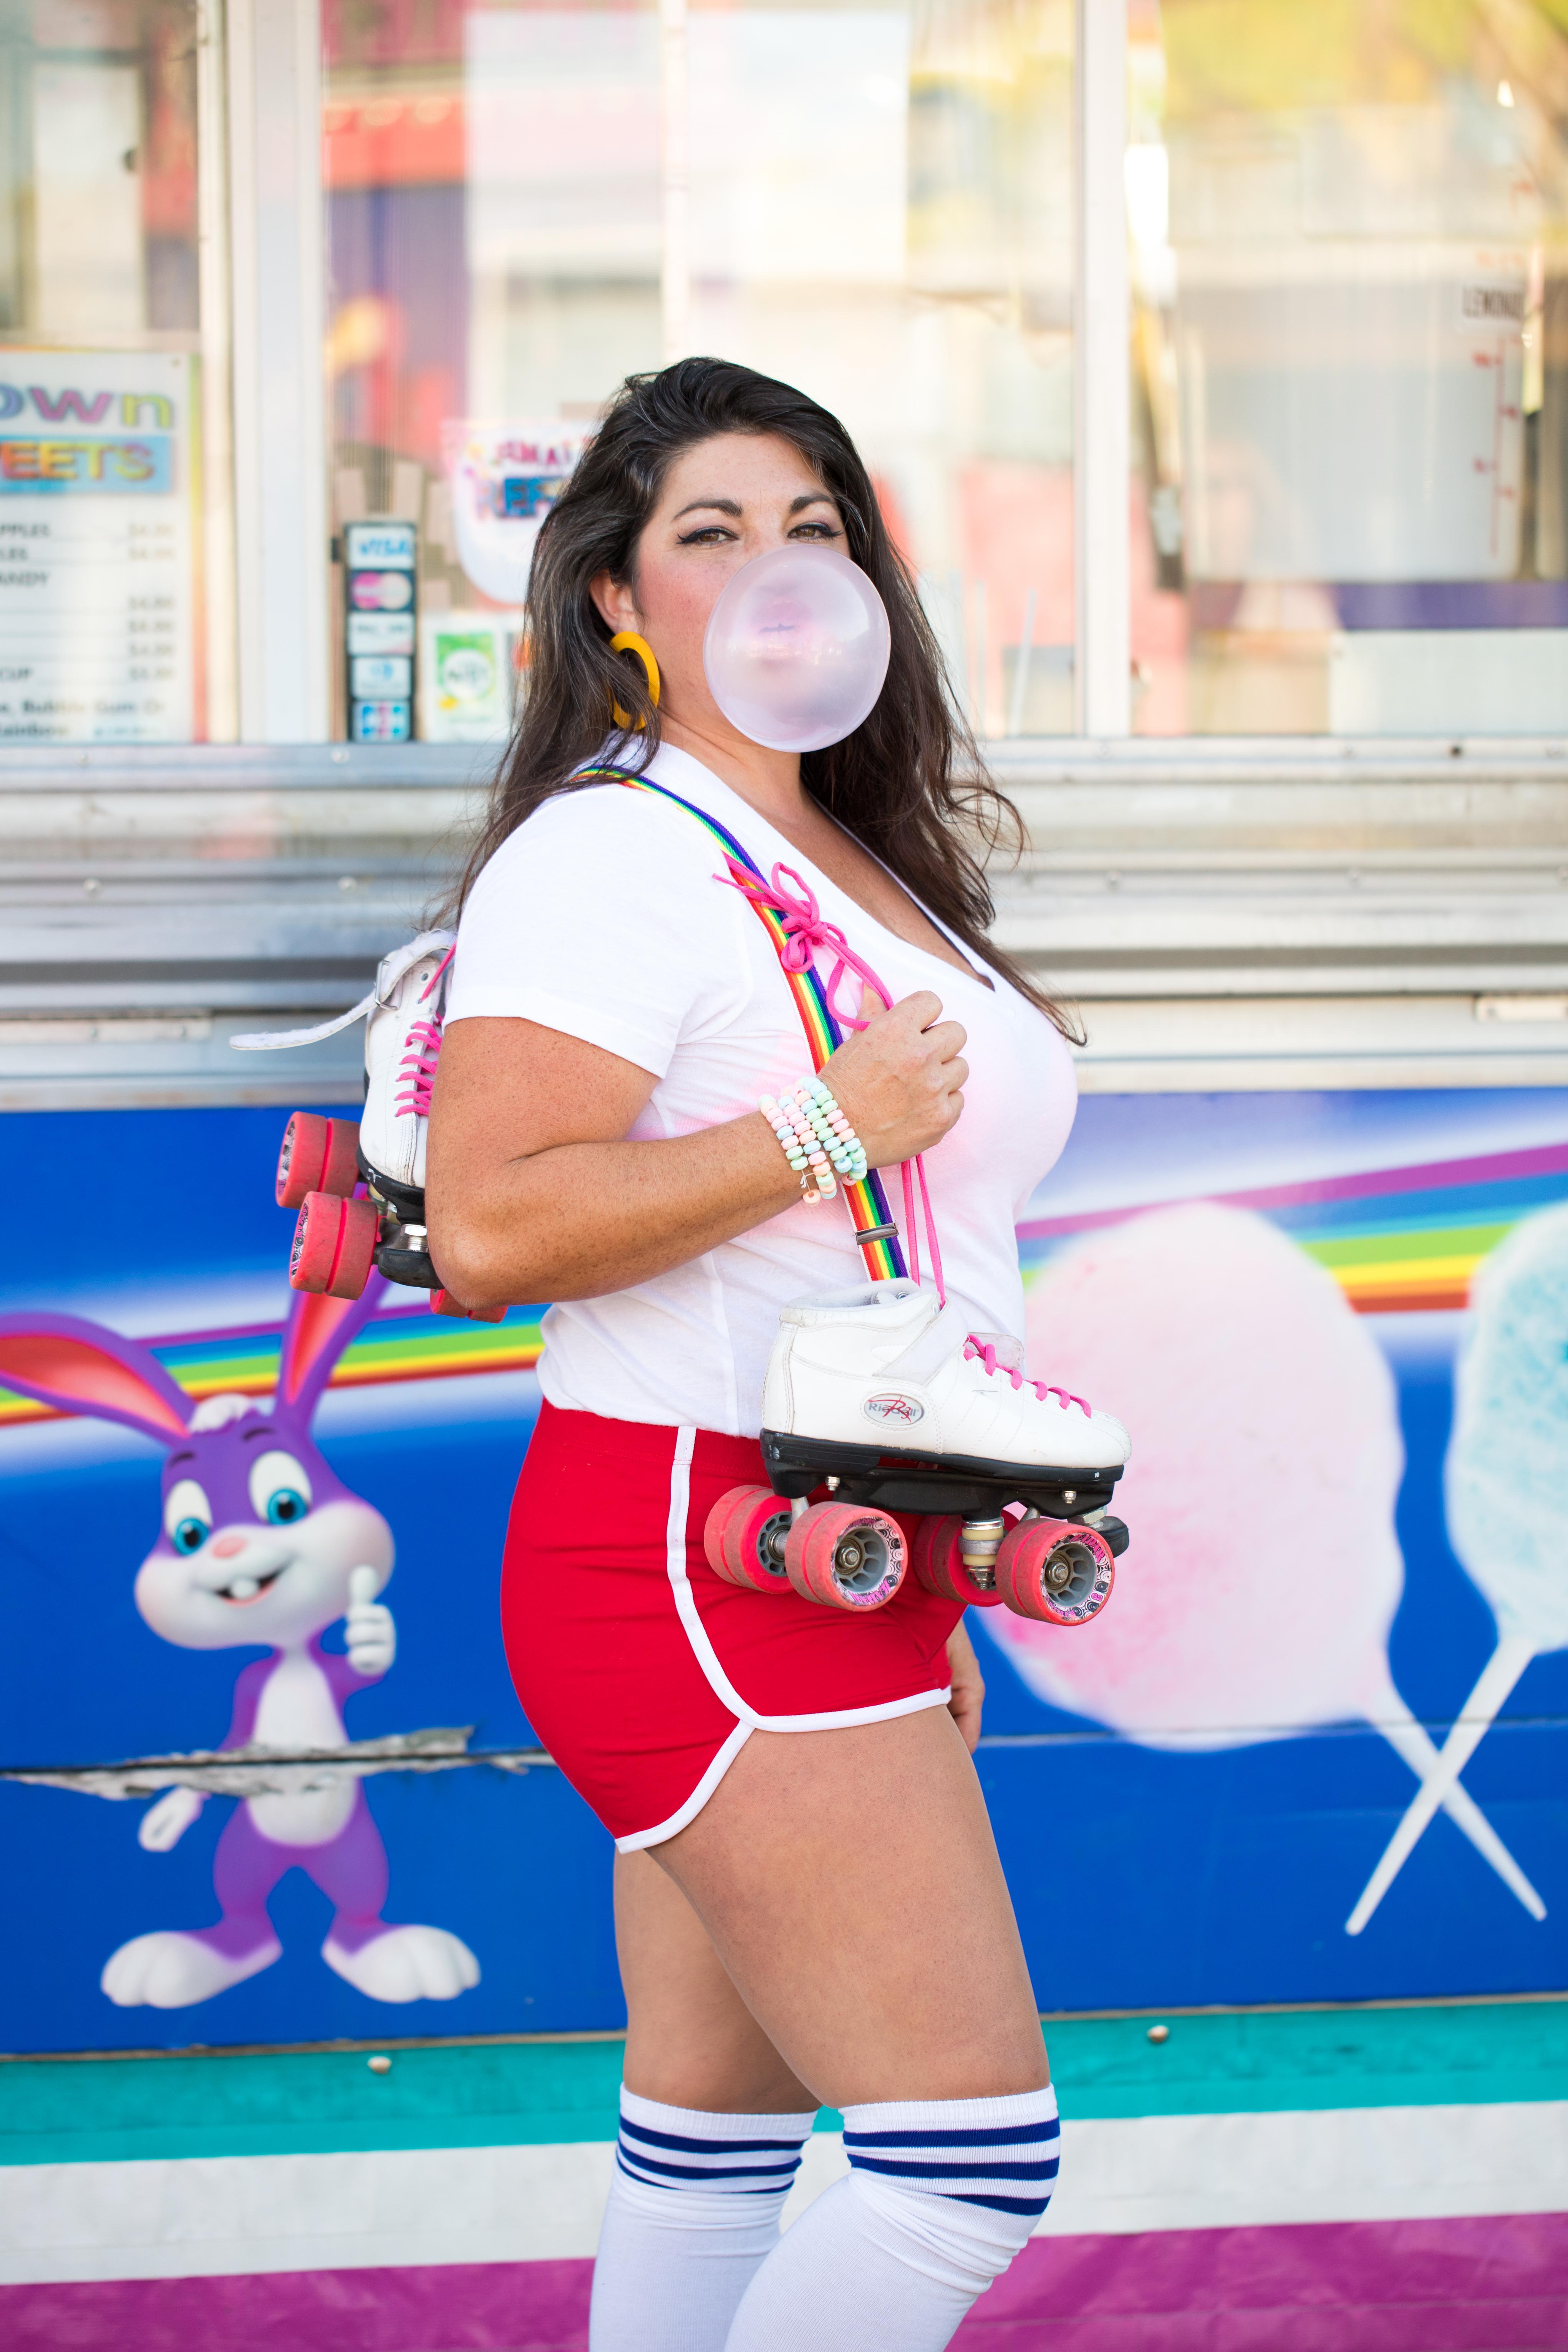 roller skates, retro, bright colors